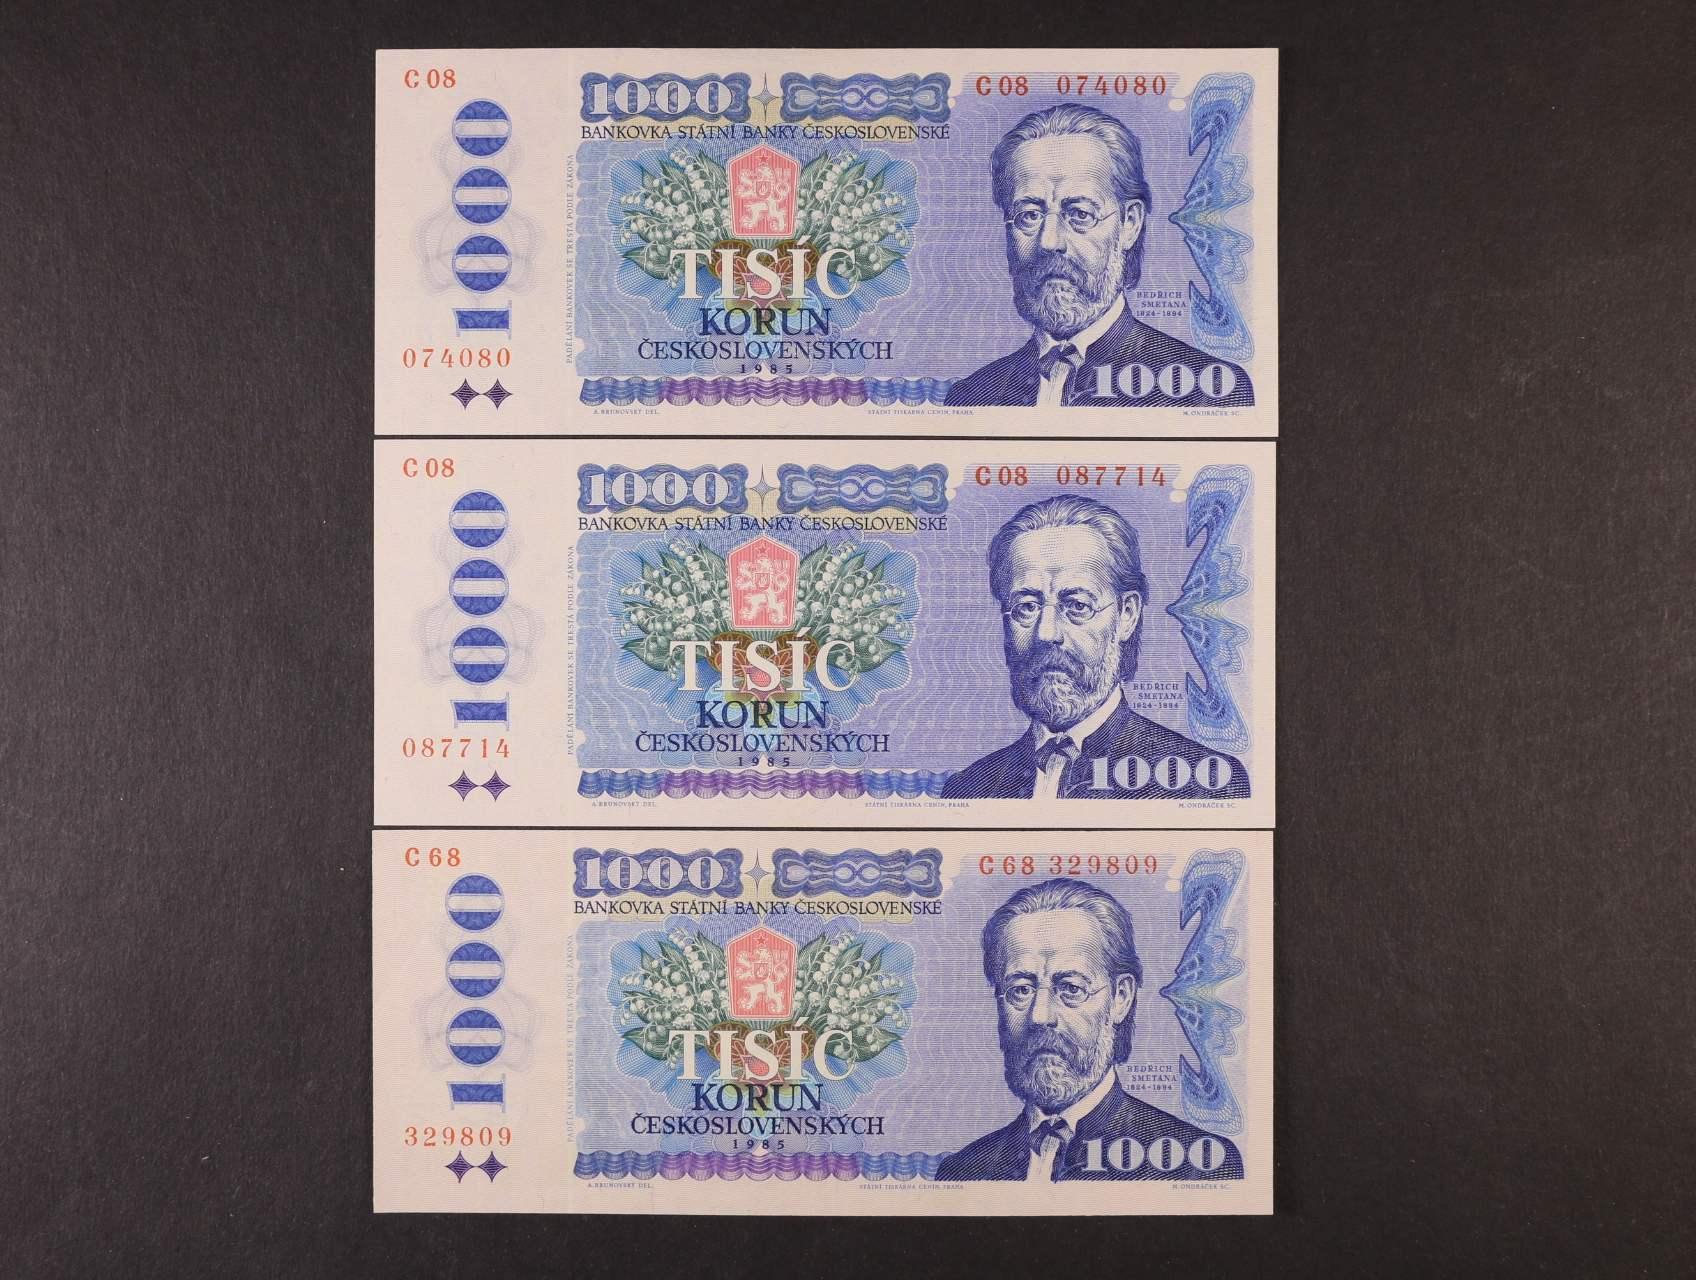 1000 Kčs 1985 série C 08 (2x), C 68, Ba. 102a, Pi. 98, 3ks